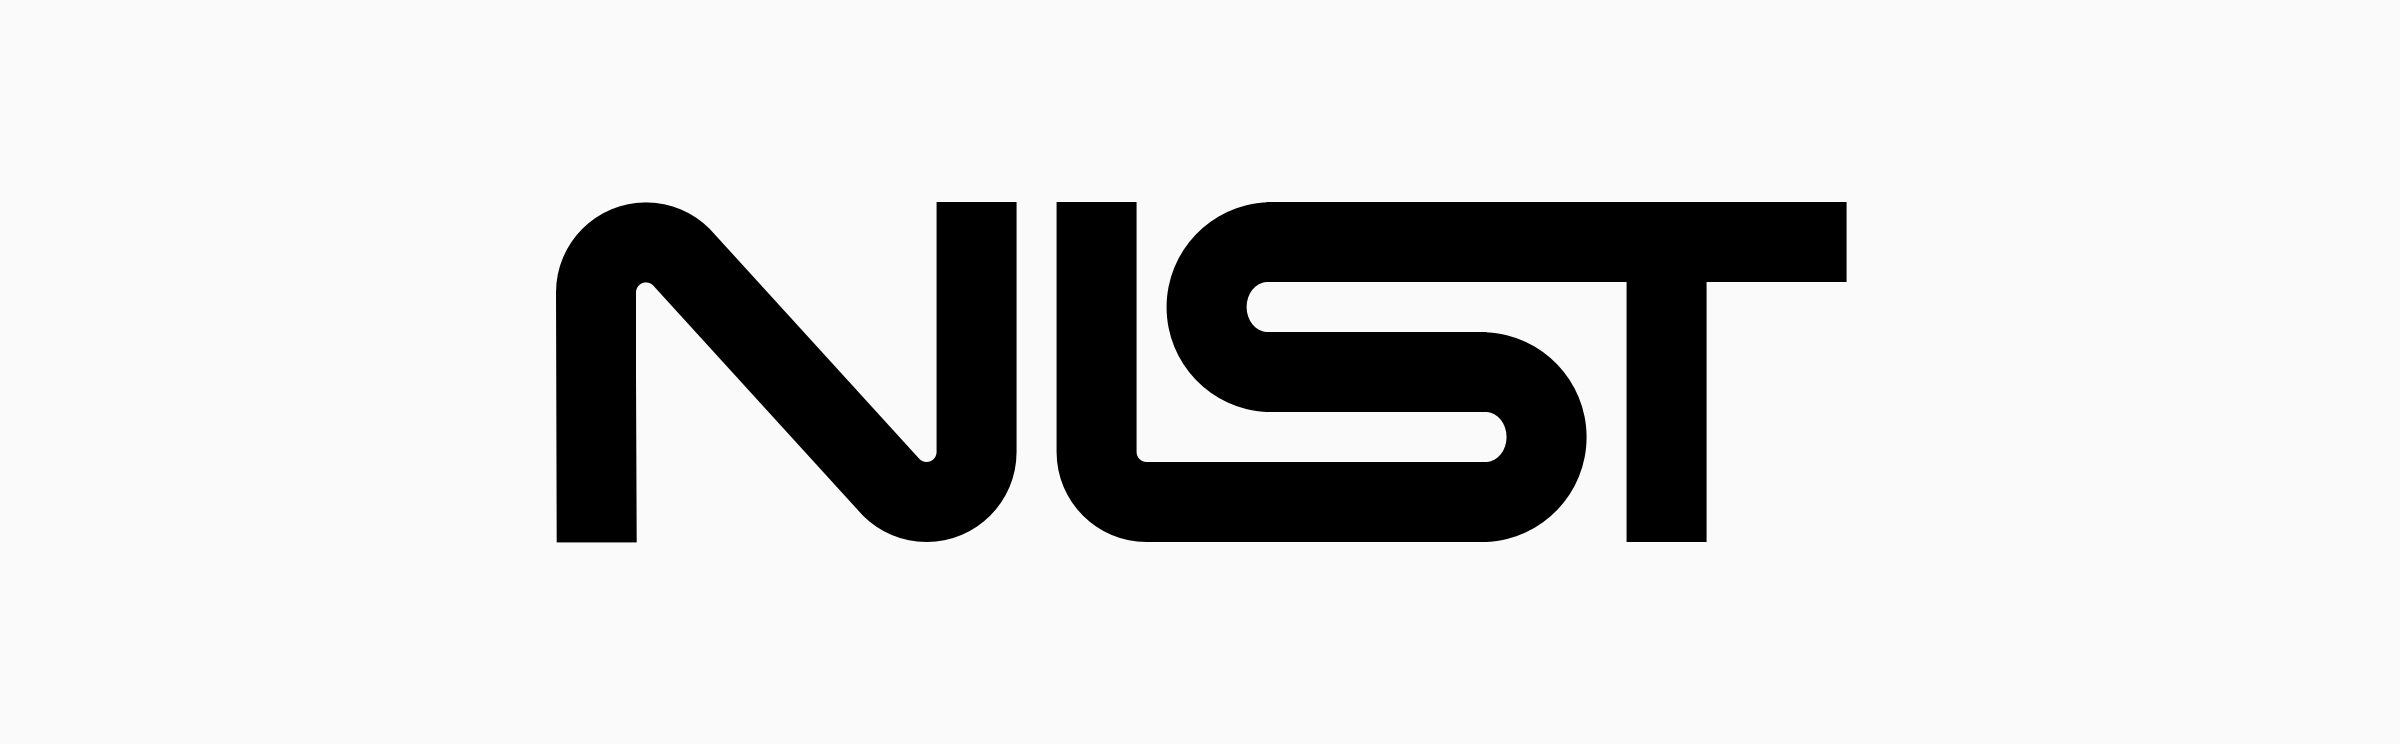 Digital Authentication Guideline: US NIST logo